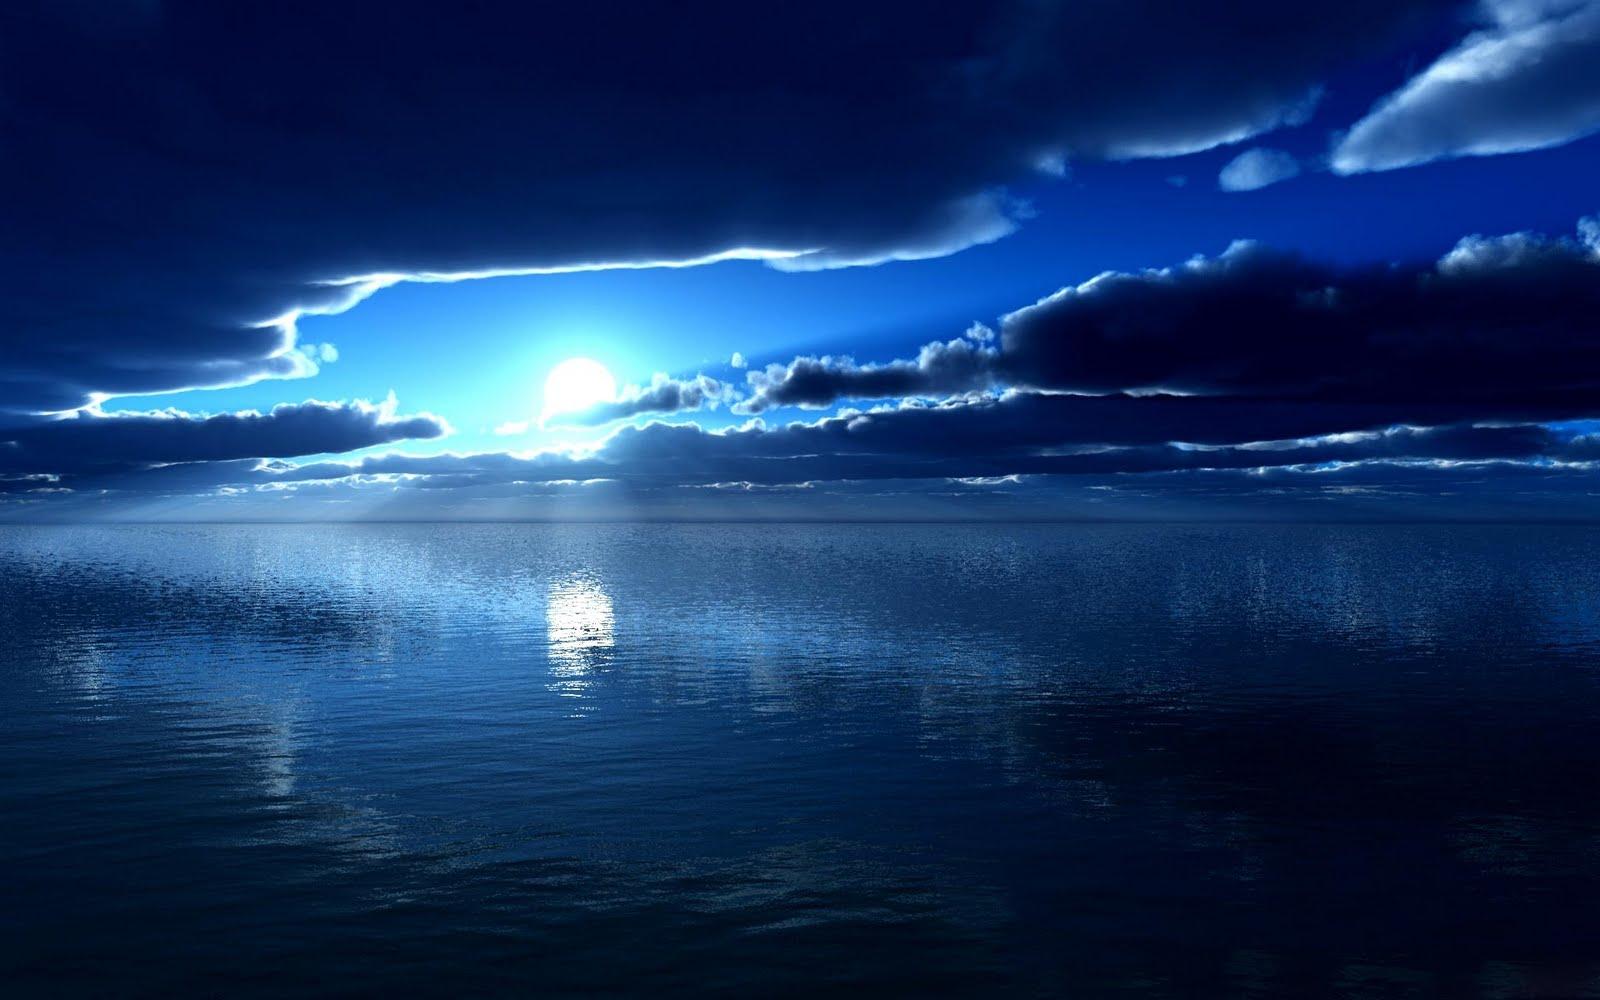 night2Bromantic - Beauty O'v NaTuRe ....... !!!!!!!!